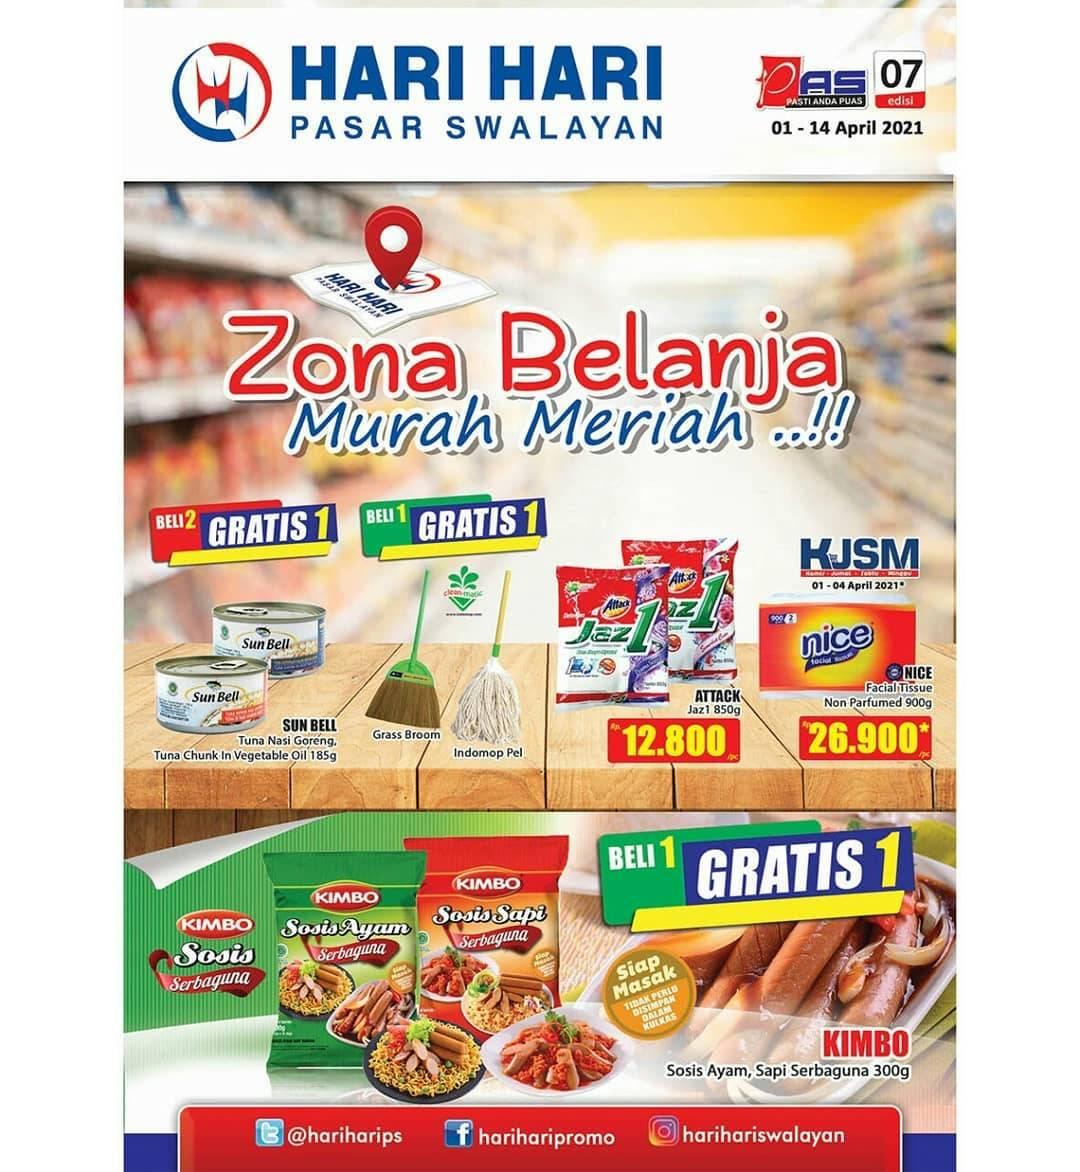 Diskon Katalog Promo Hari Hari Swalayan Promo PAS Periode 1 - 14 April 2021